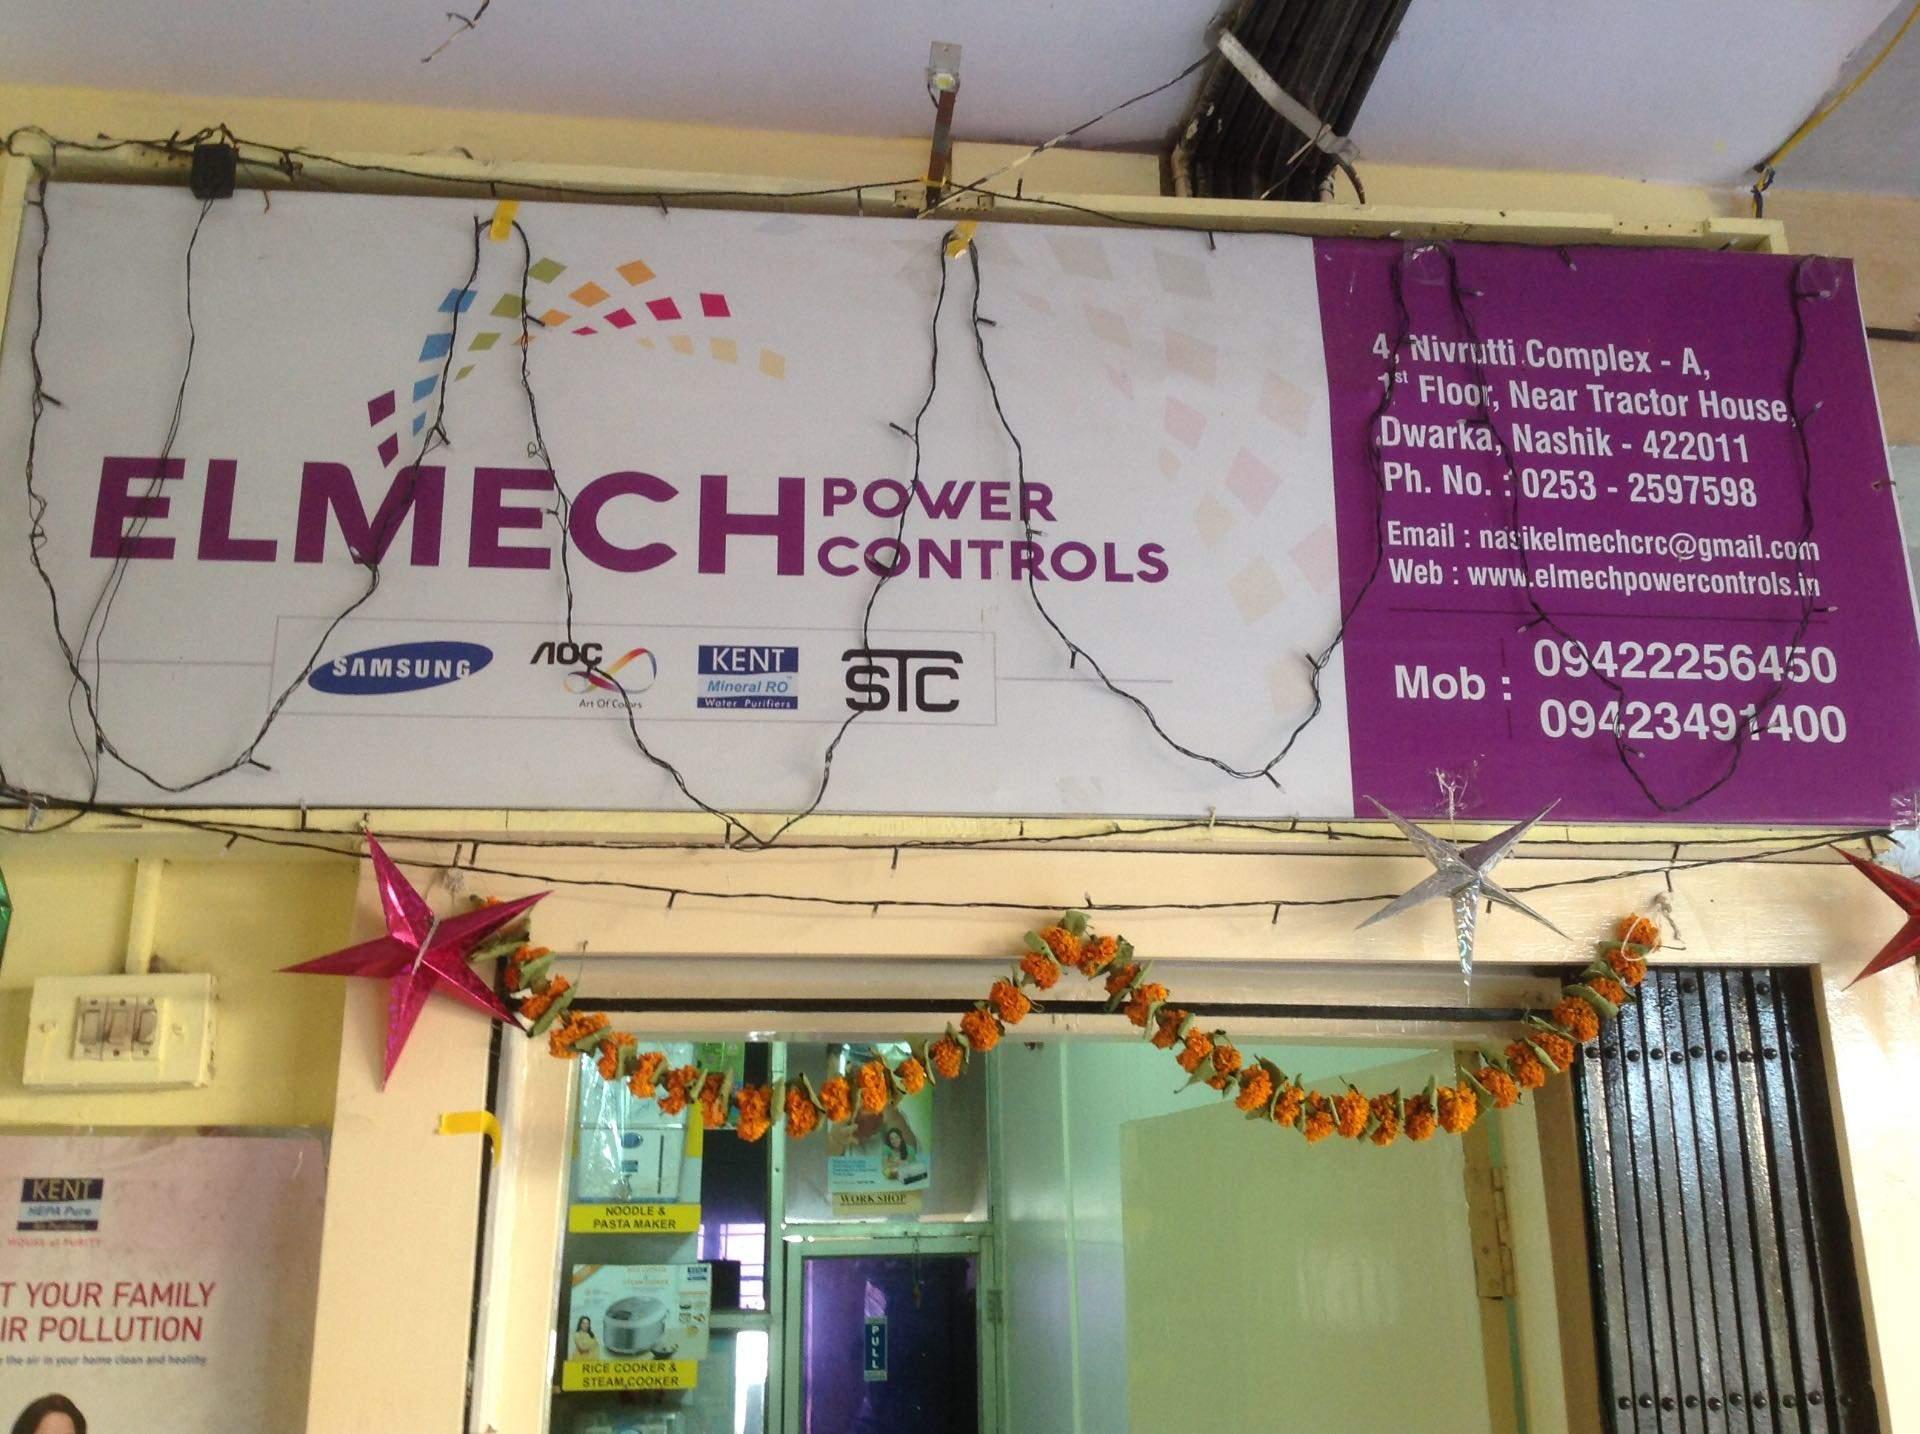 Top 50 Projector Shops in Indira Nagar Nashik, Nashik - Best